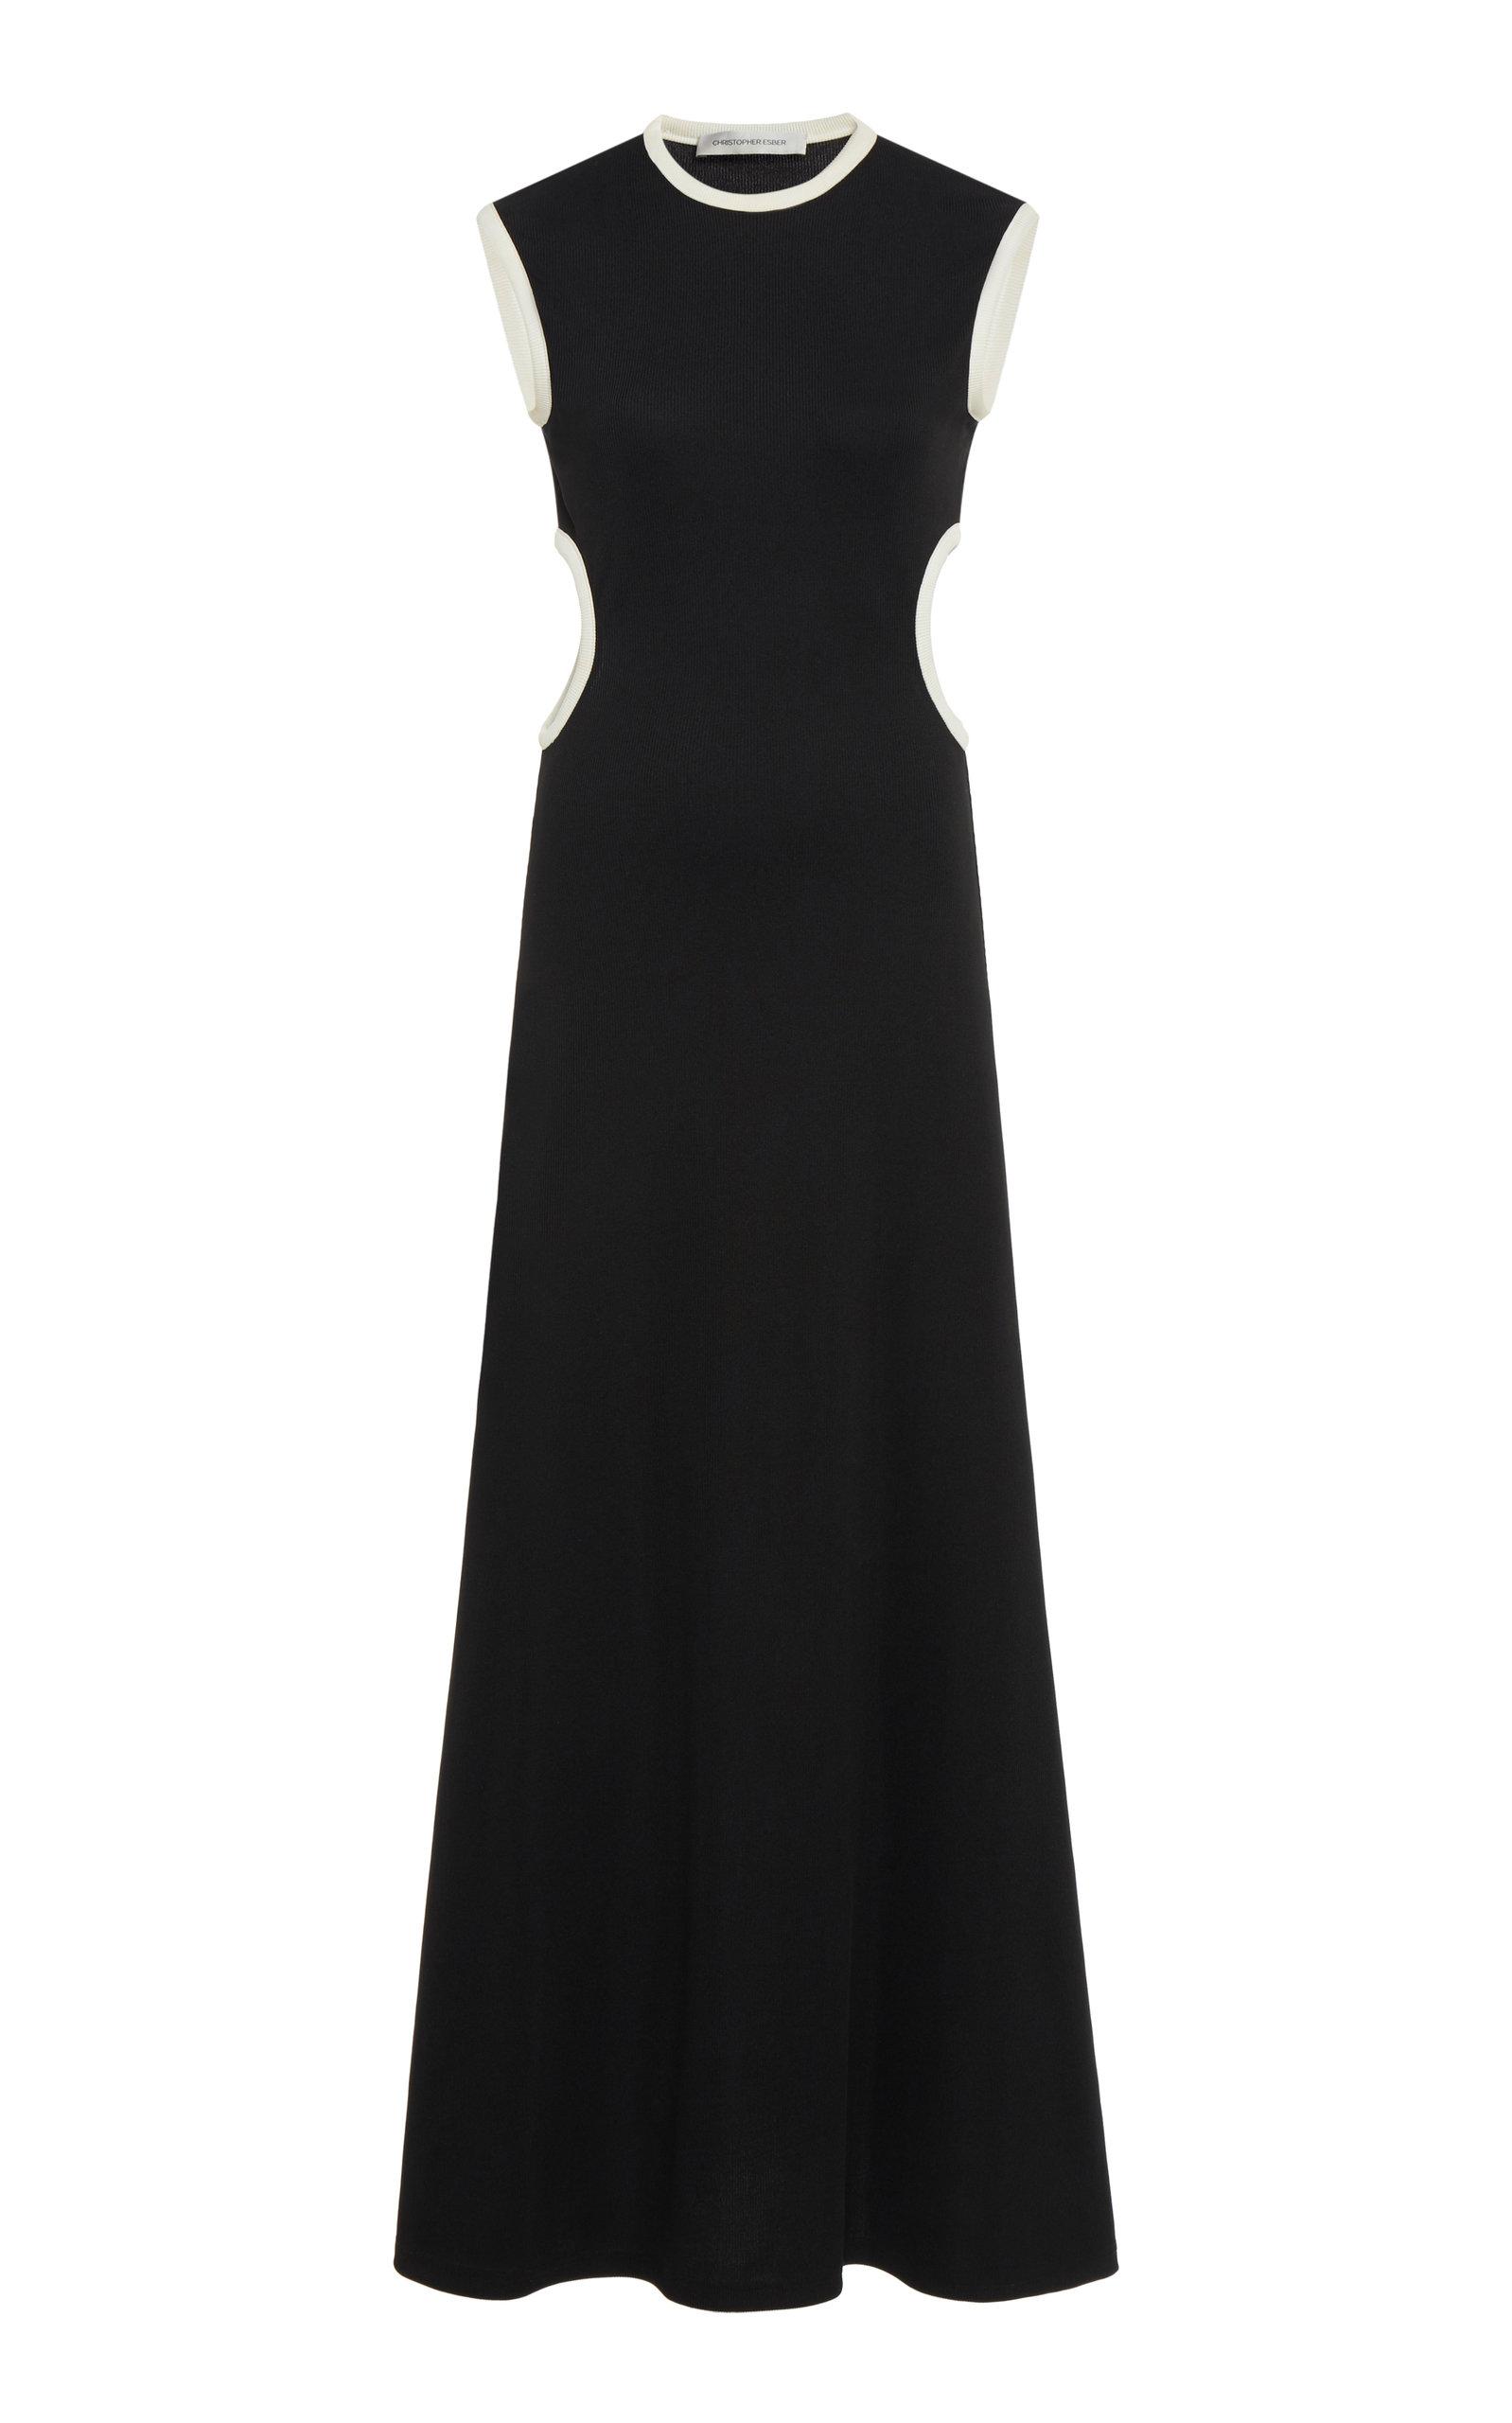 Buy Christopher Esber Fran Cutout Ribbed-Knit Dress online, shop Christopher Esber at the best price